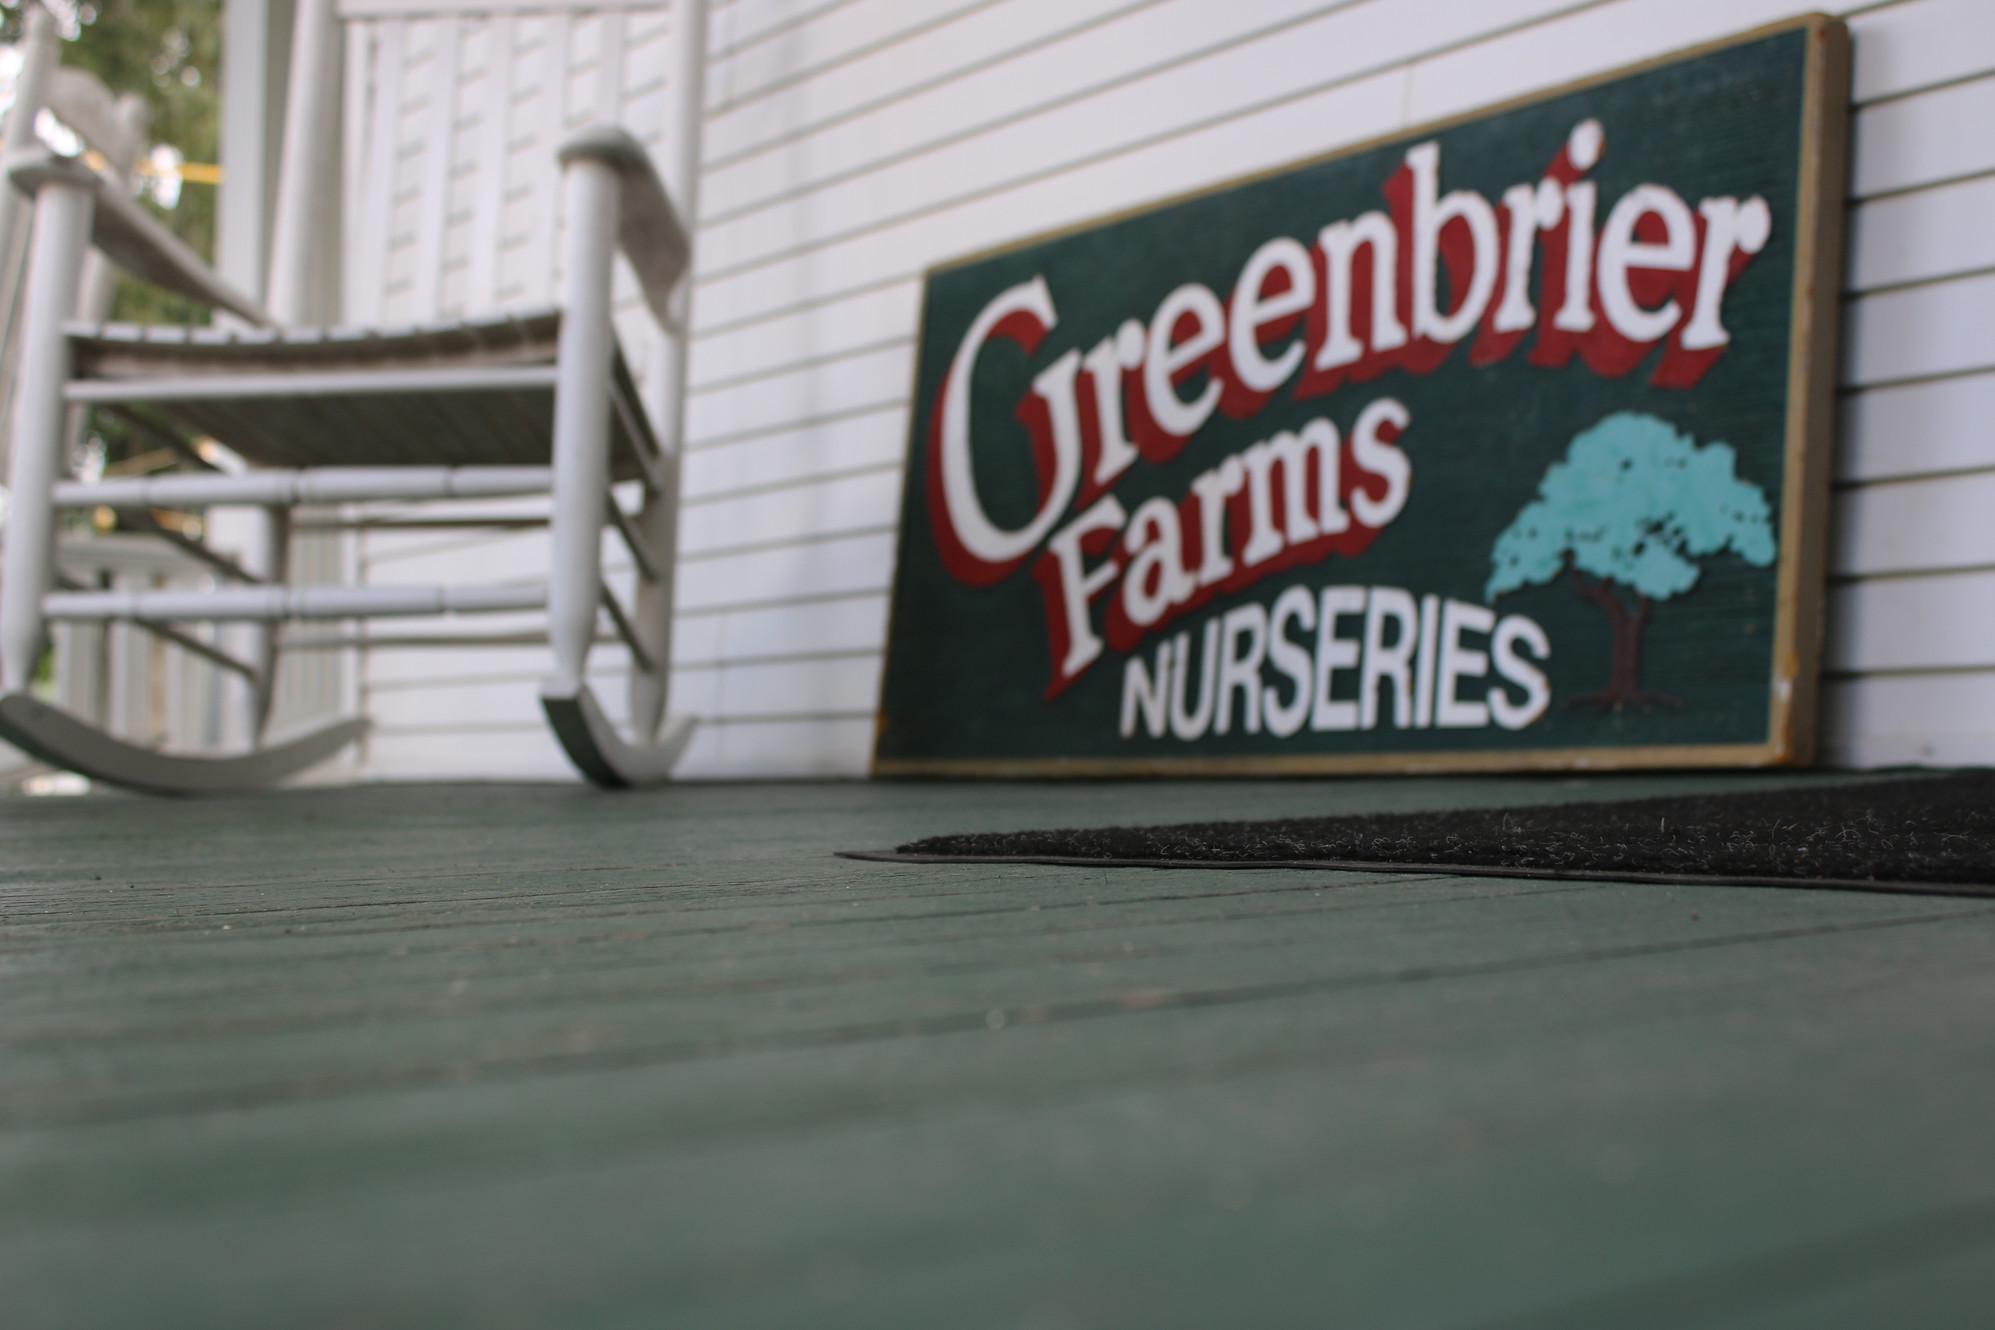 Weddings Events Greenbrier Farms